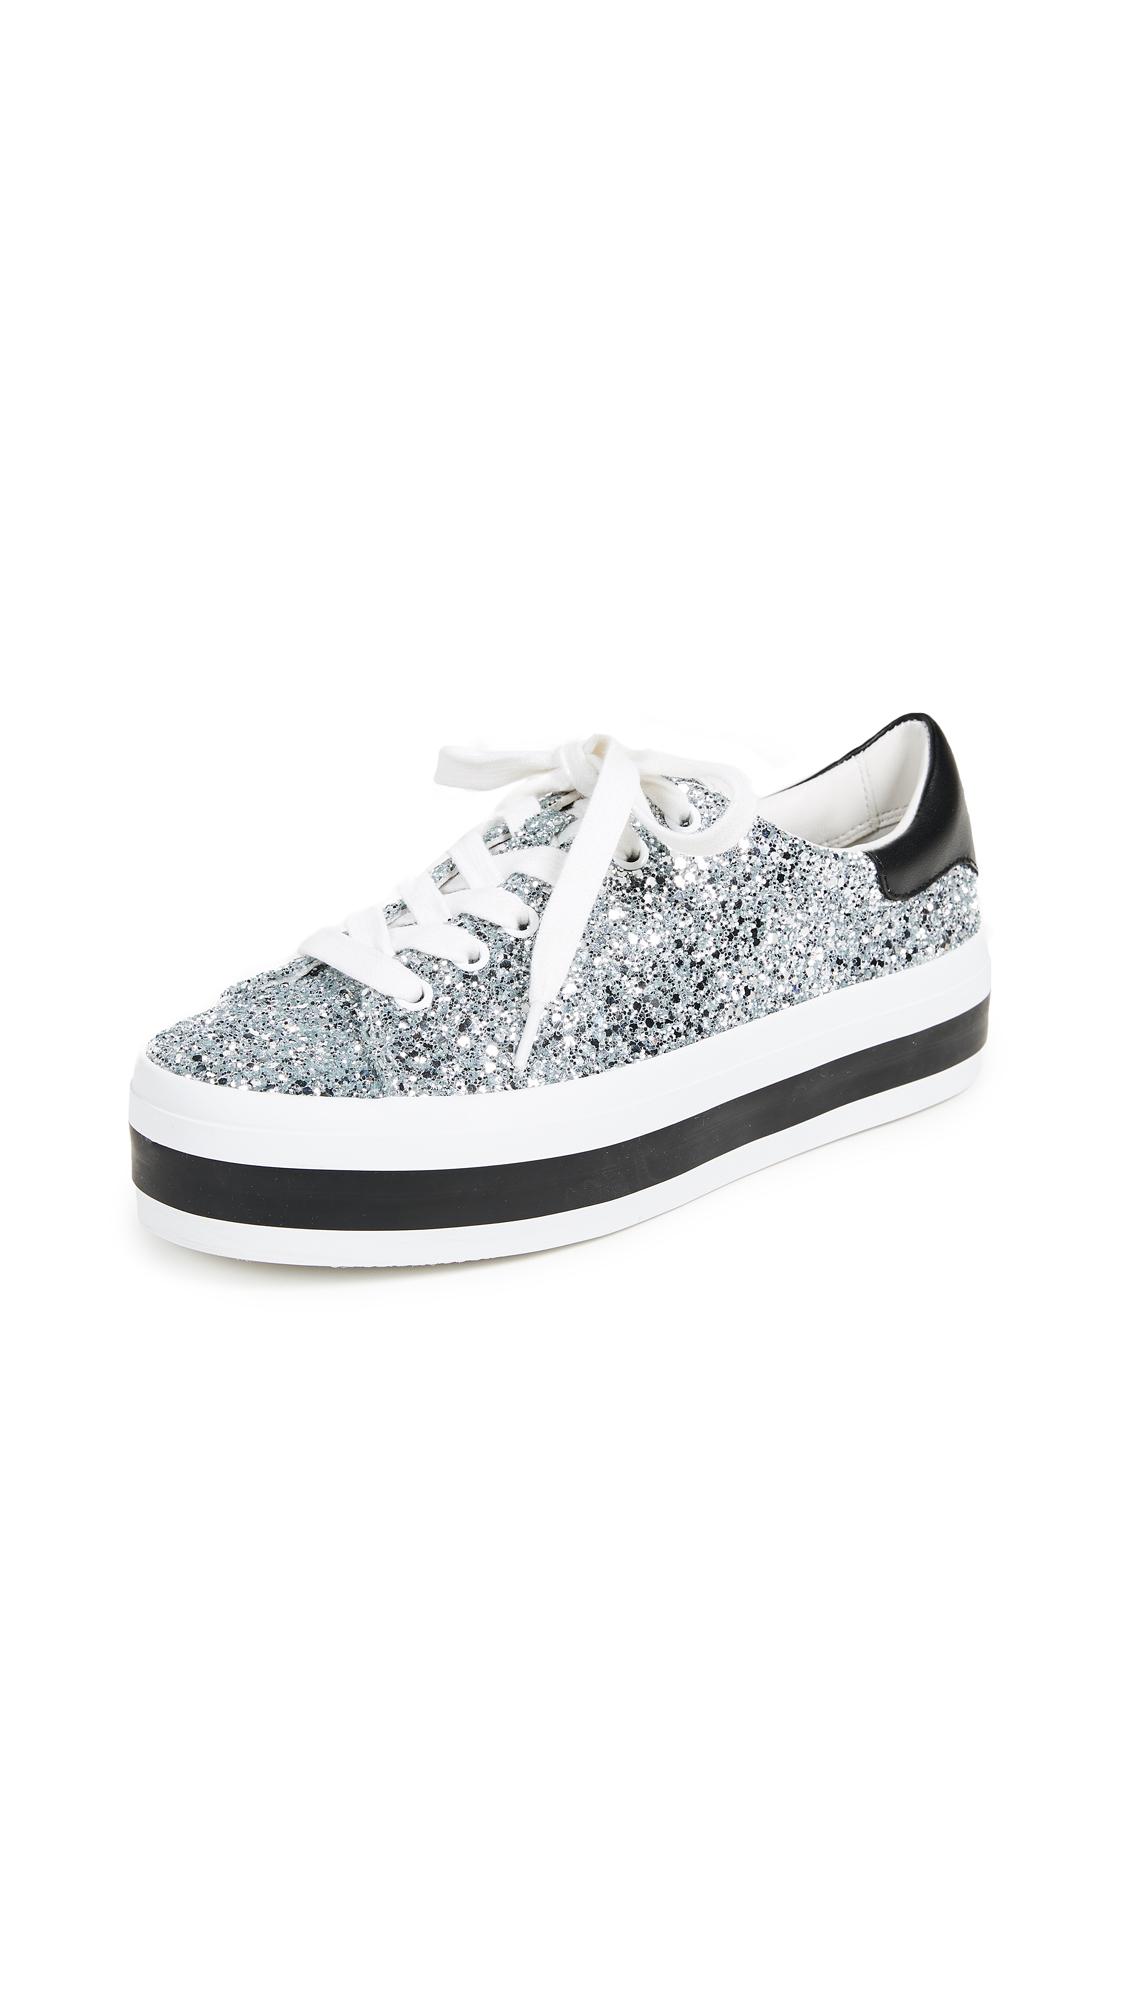 alice + olivia Ezra Platform Sneakers - Silver